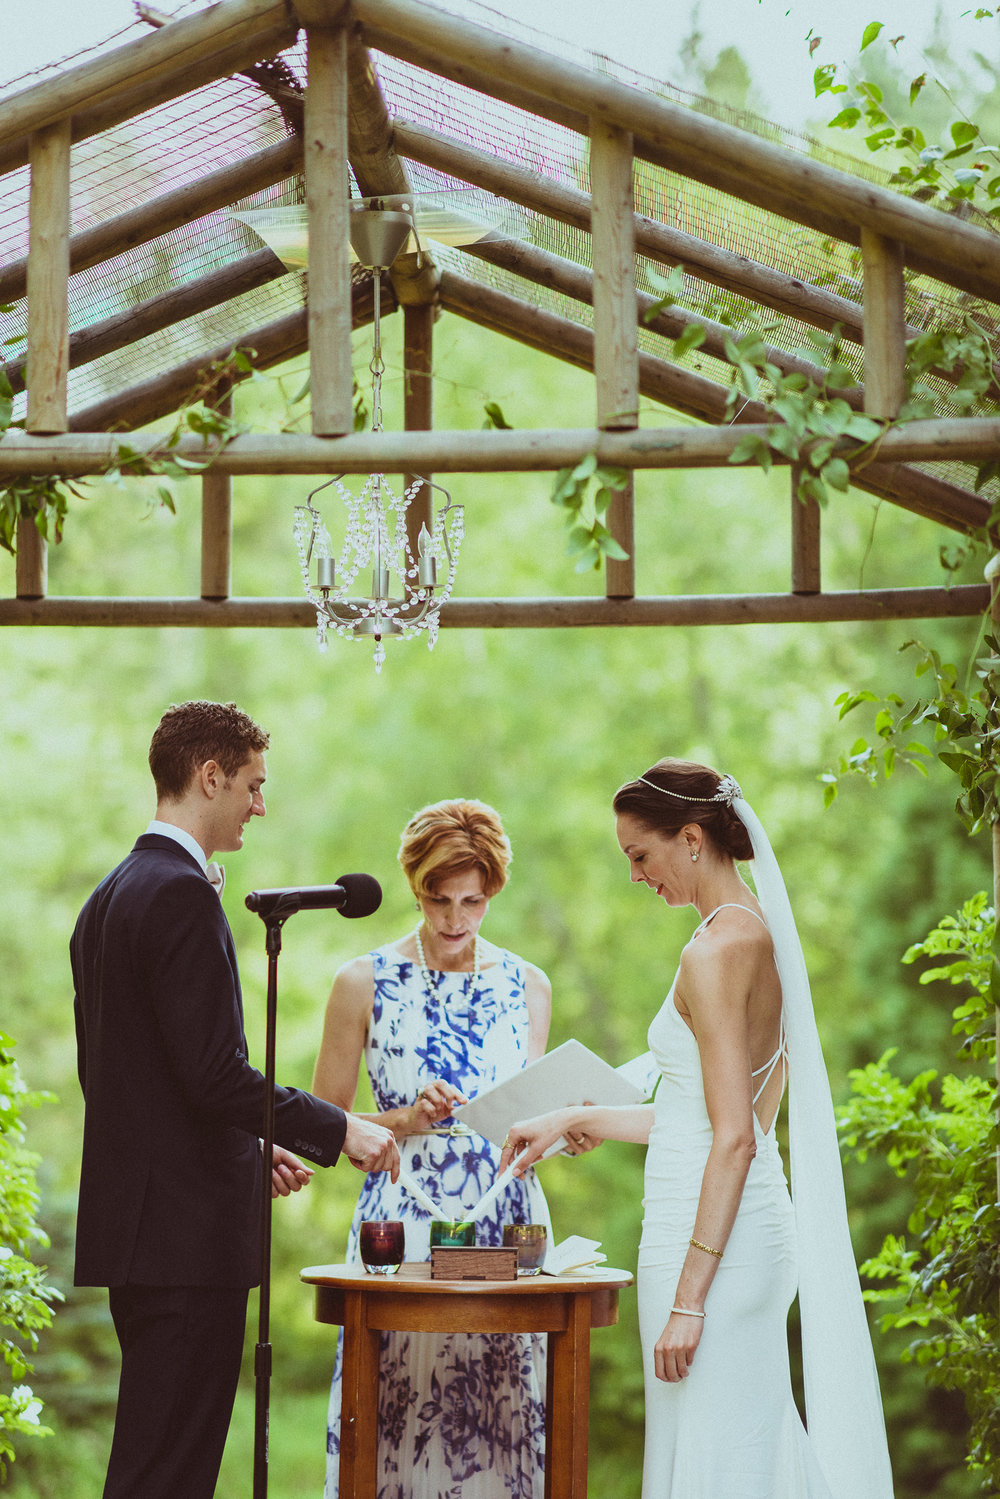 BEST_CHICAG_WEDDING_PHOTOGRAPHER_ZOE_RAIN_-60.jpg